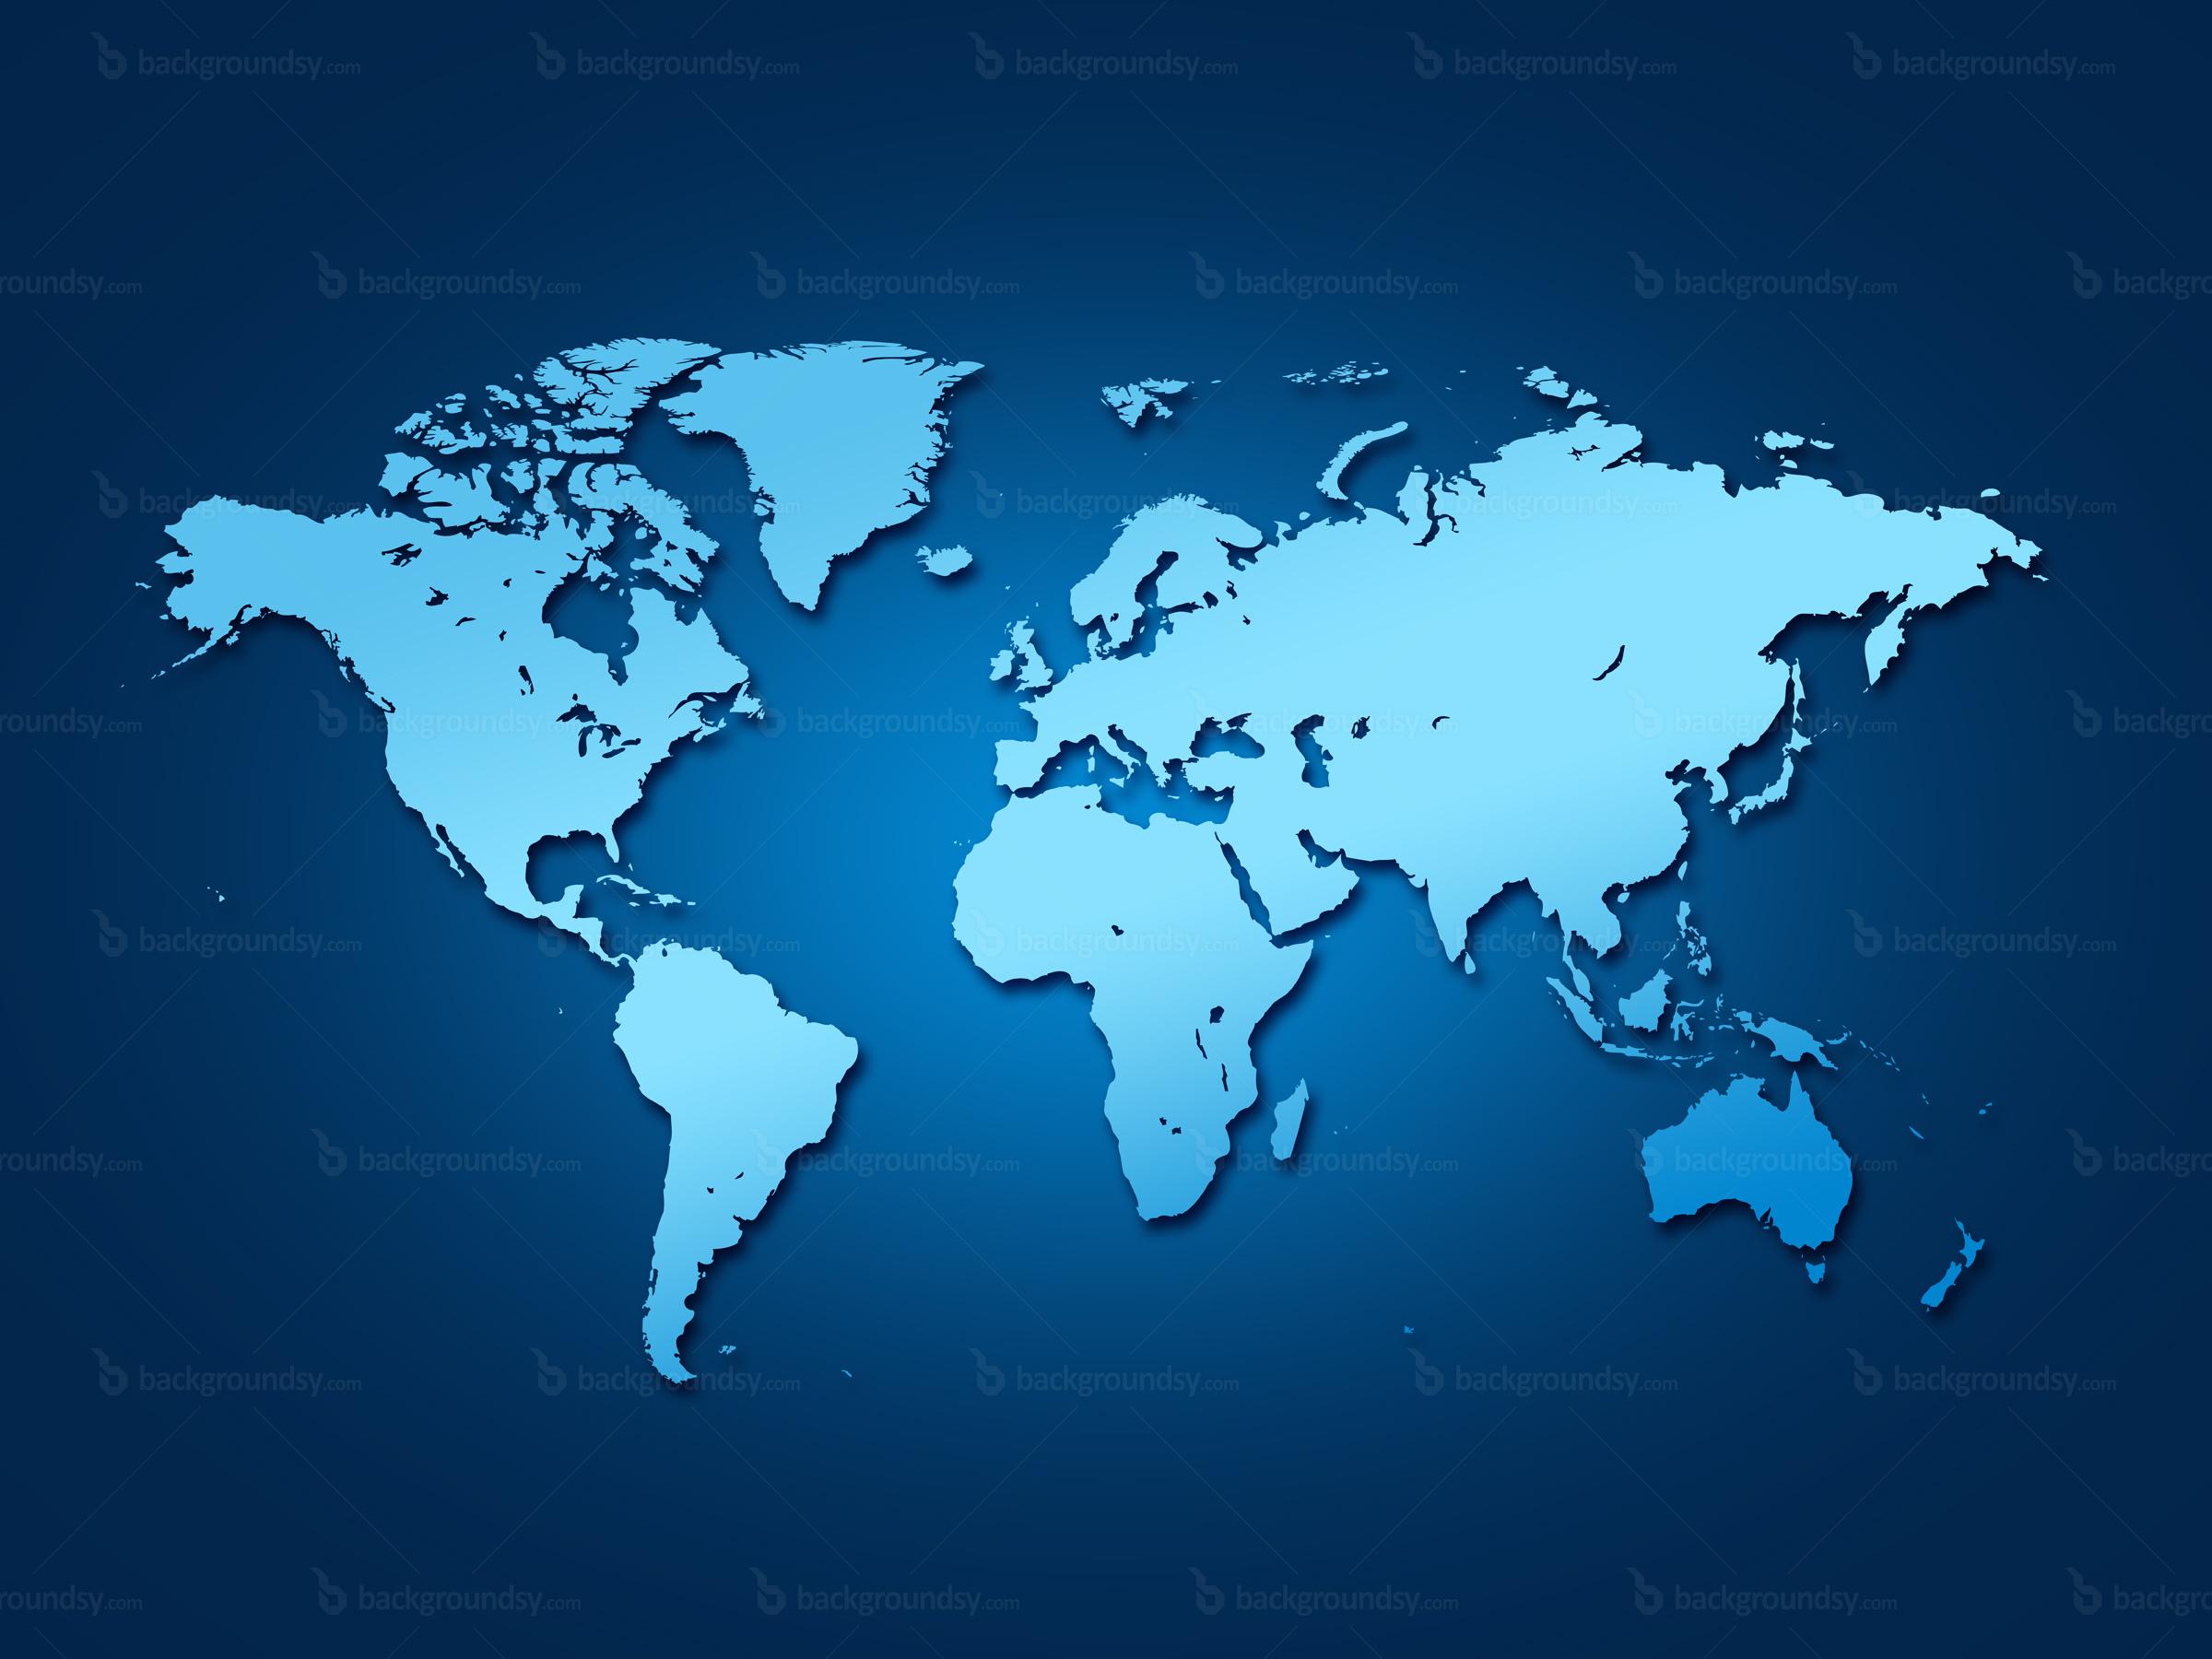 Blueworldmap Dream Achievers Academy - World map image